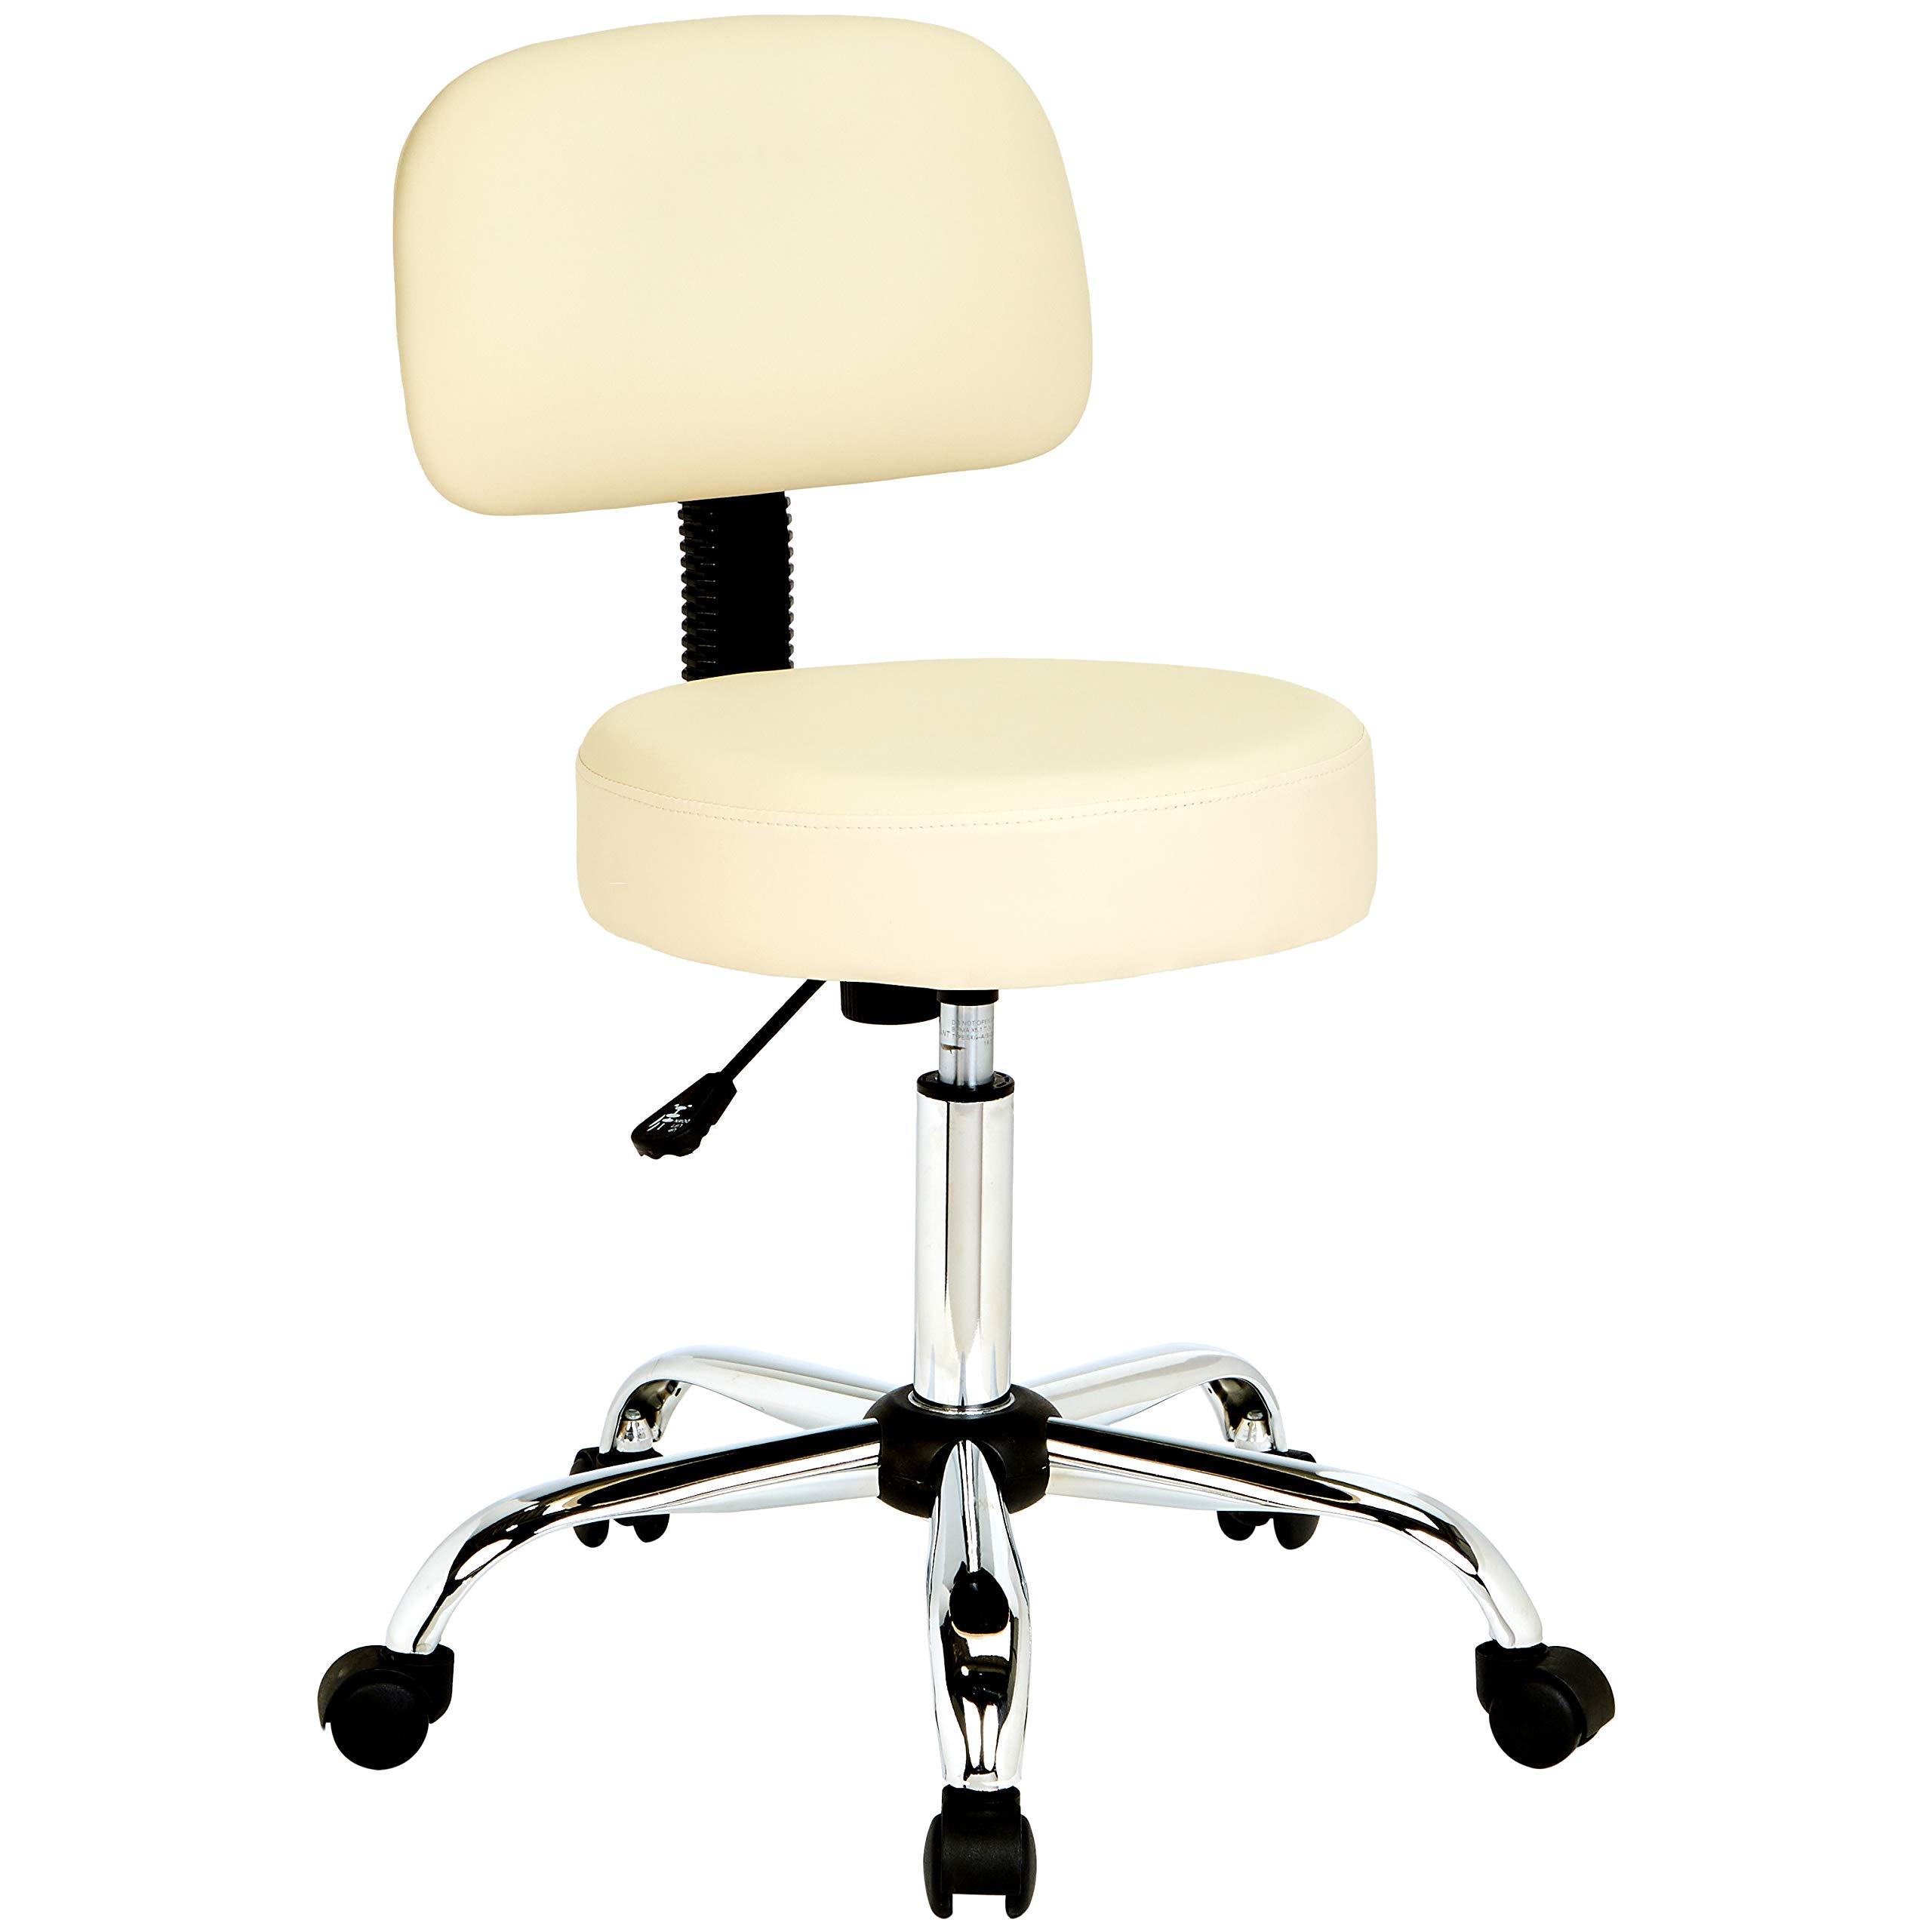 AmazonBasics Multi-Purpose Adjustable Office Drafting Spa Stool with Back Cushion and Wheels - Beige